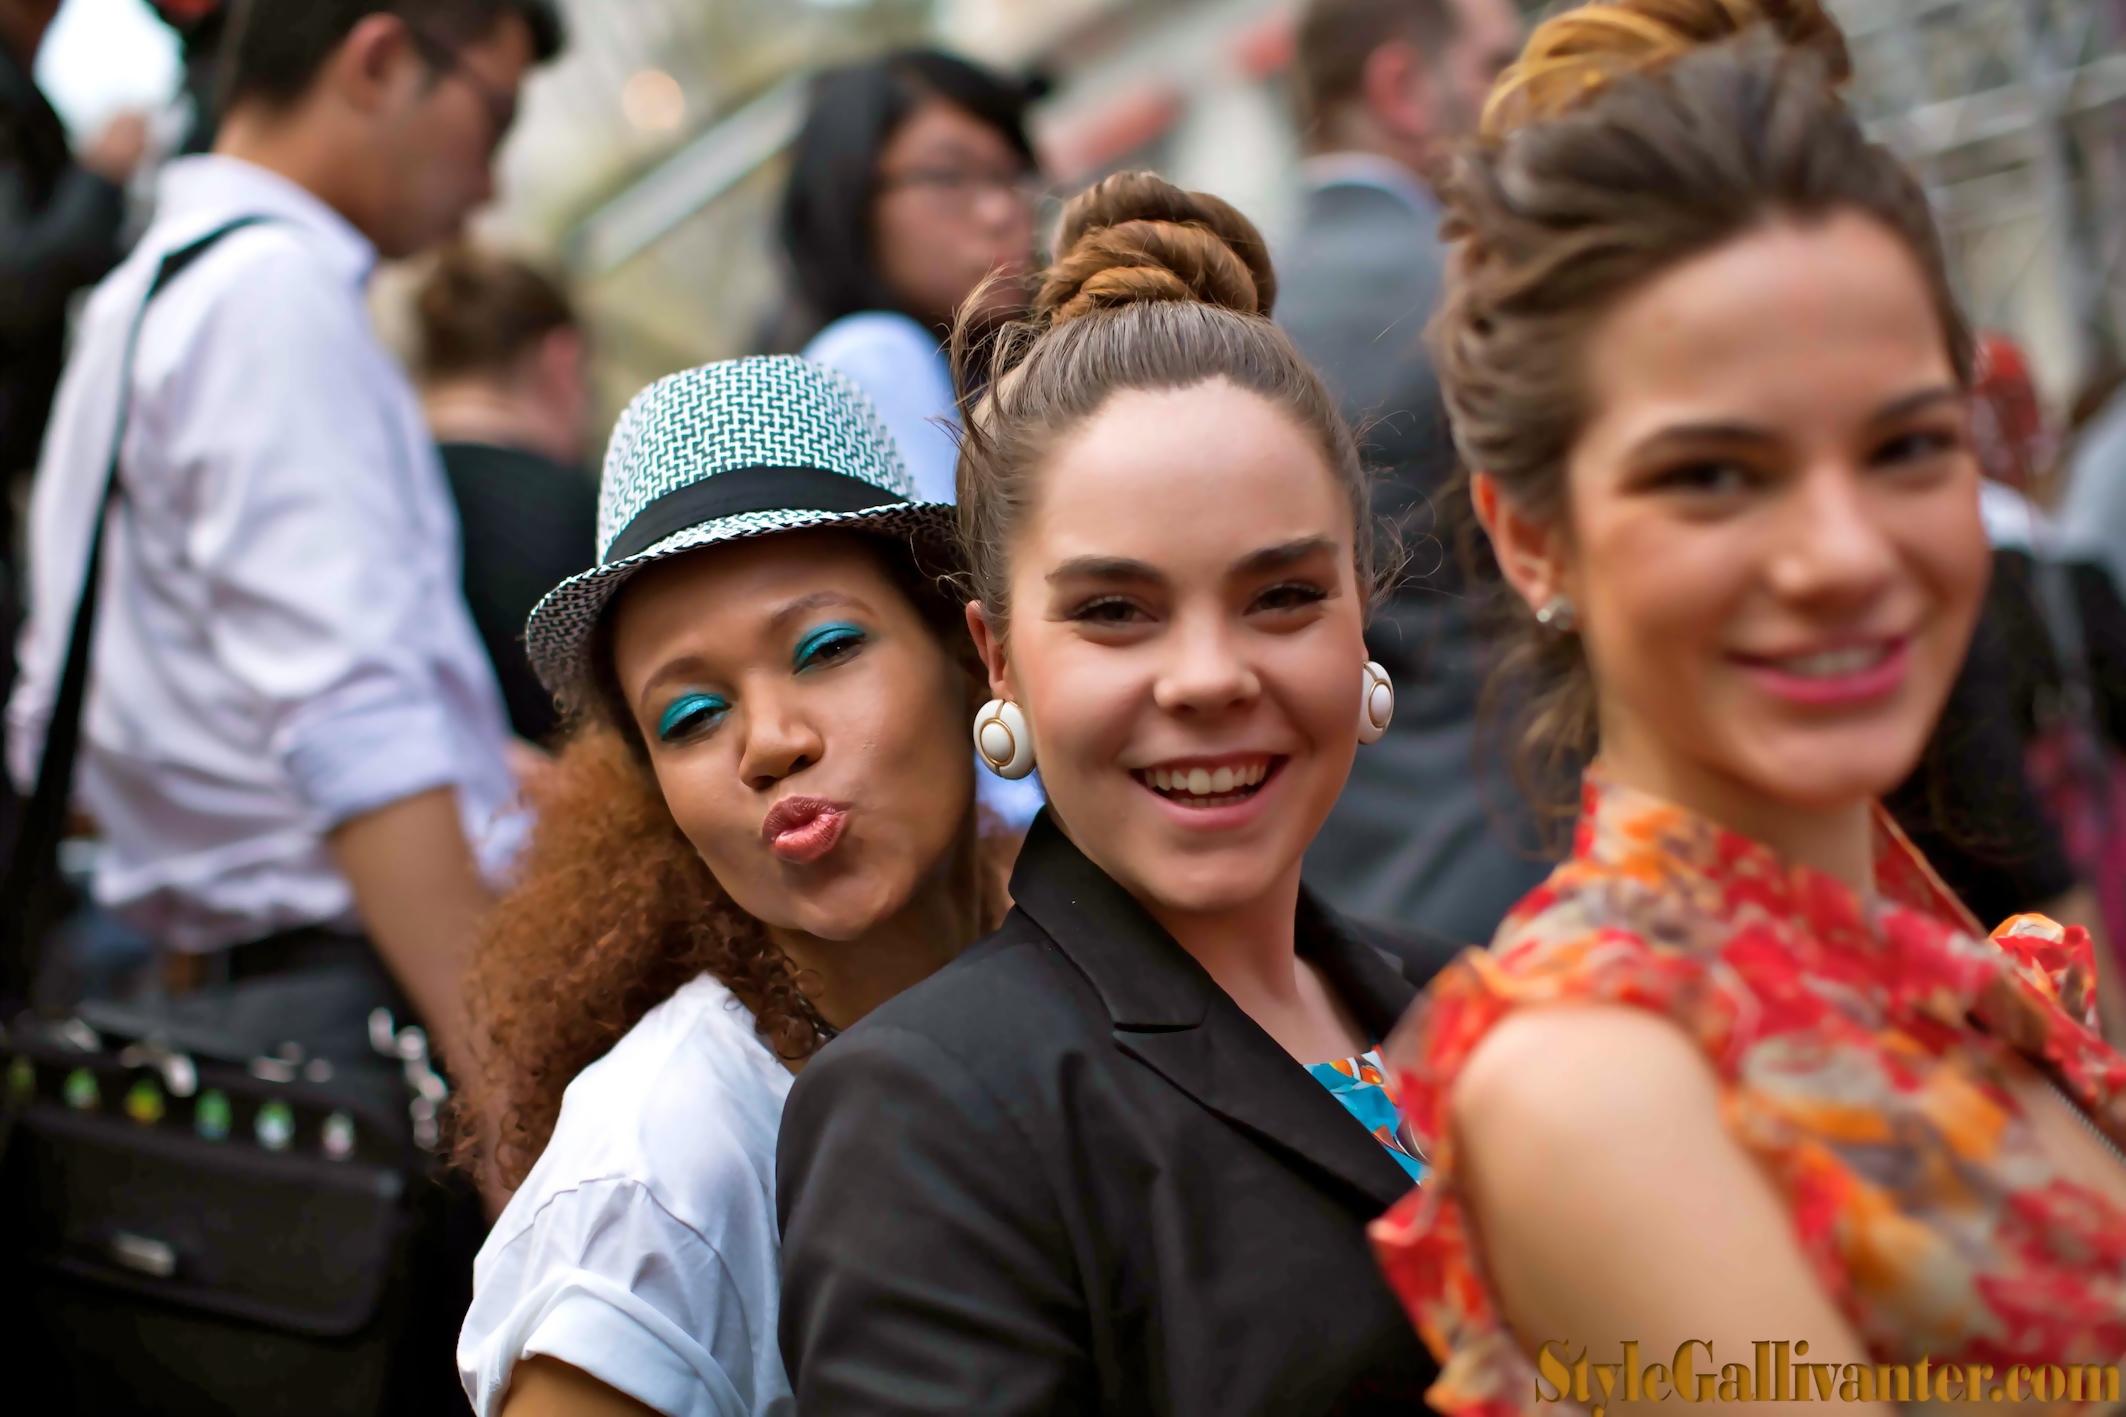 msfw13 street fashion